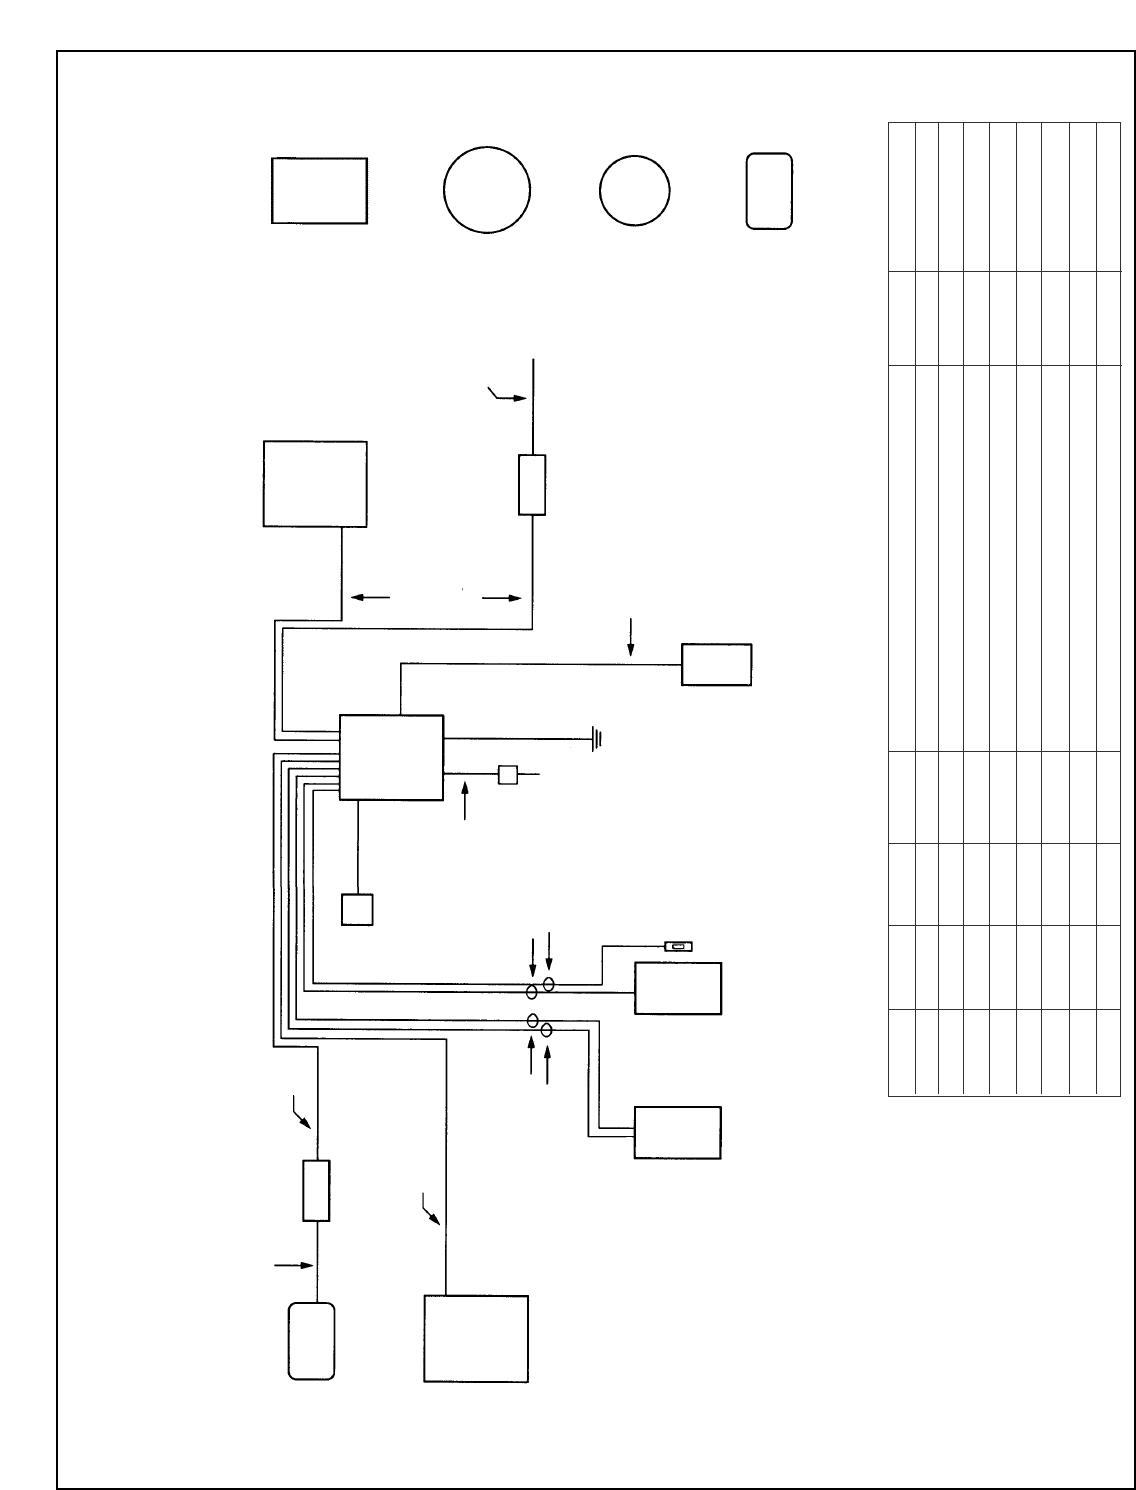 Nutone Intercom System Ik 25 Users Manual Fs 1600 Guide Volume Control Wiring Diagram For Wall Im 5000 Block Diagrams